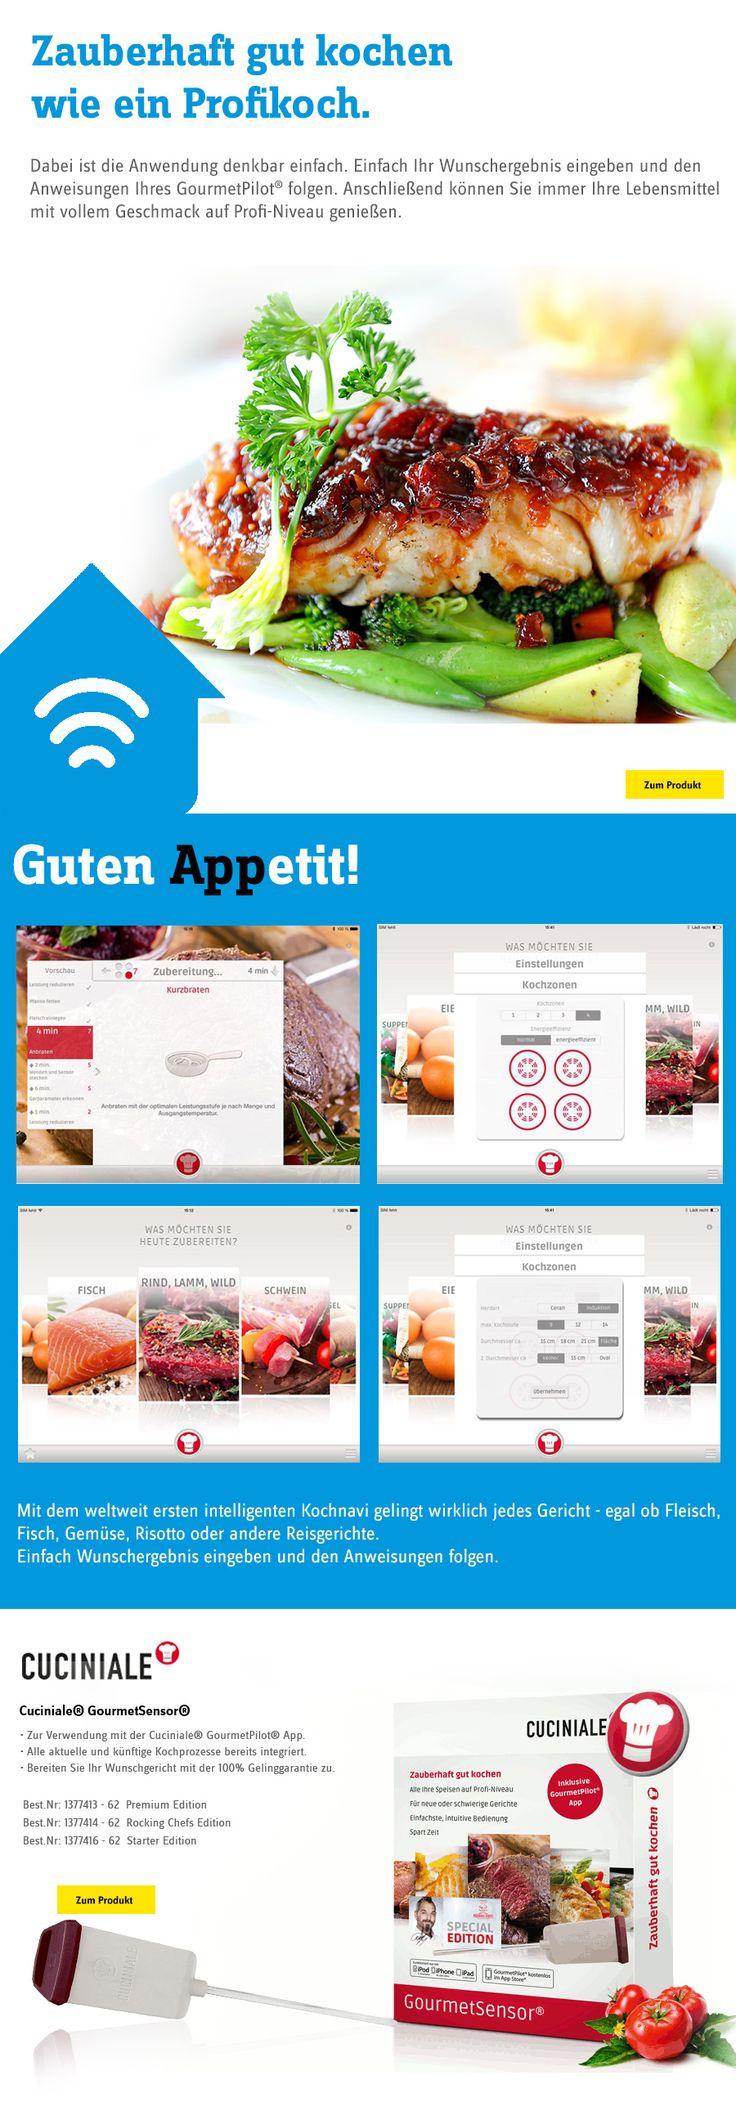 die kostenlose Koch-App Kochnavi Cuciniale ...